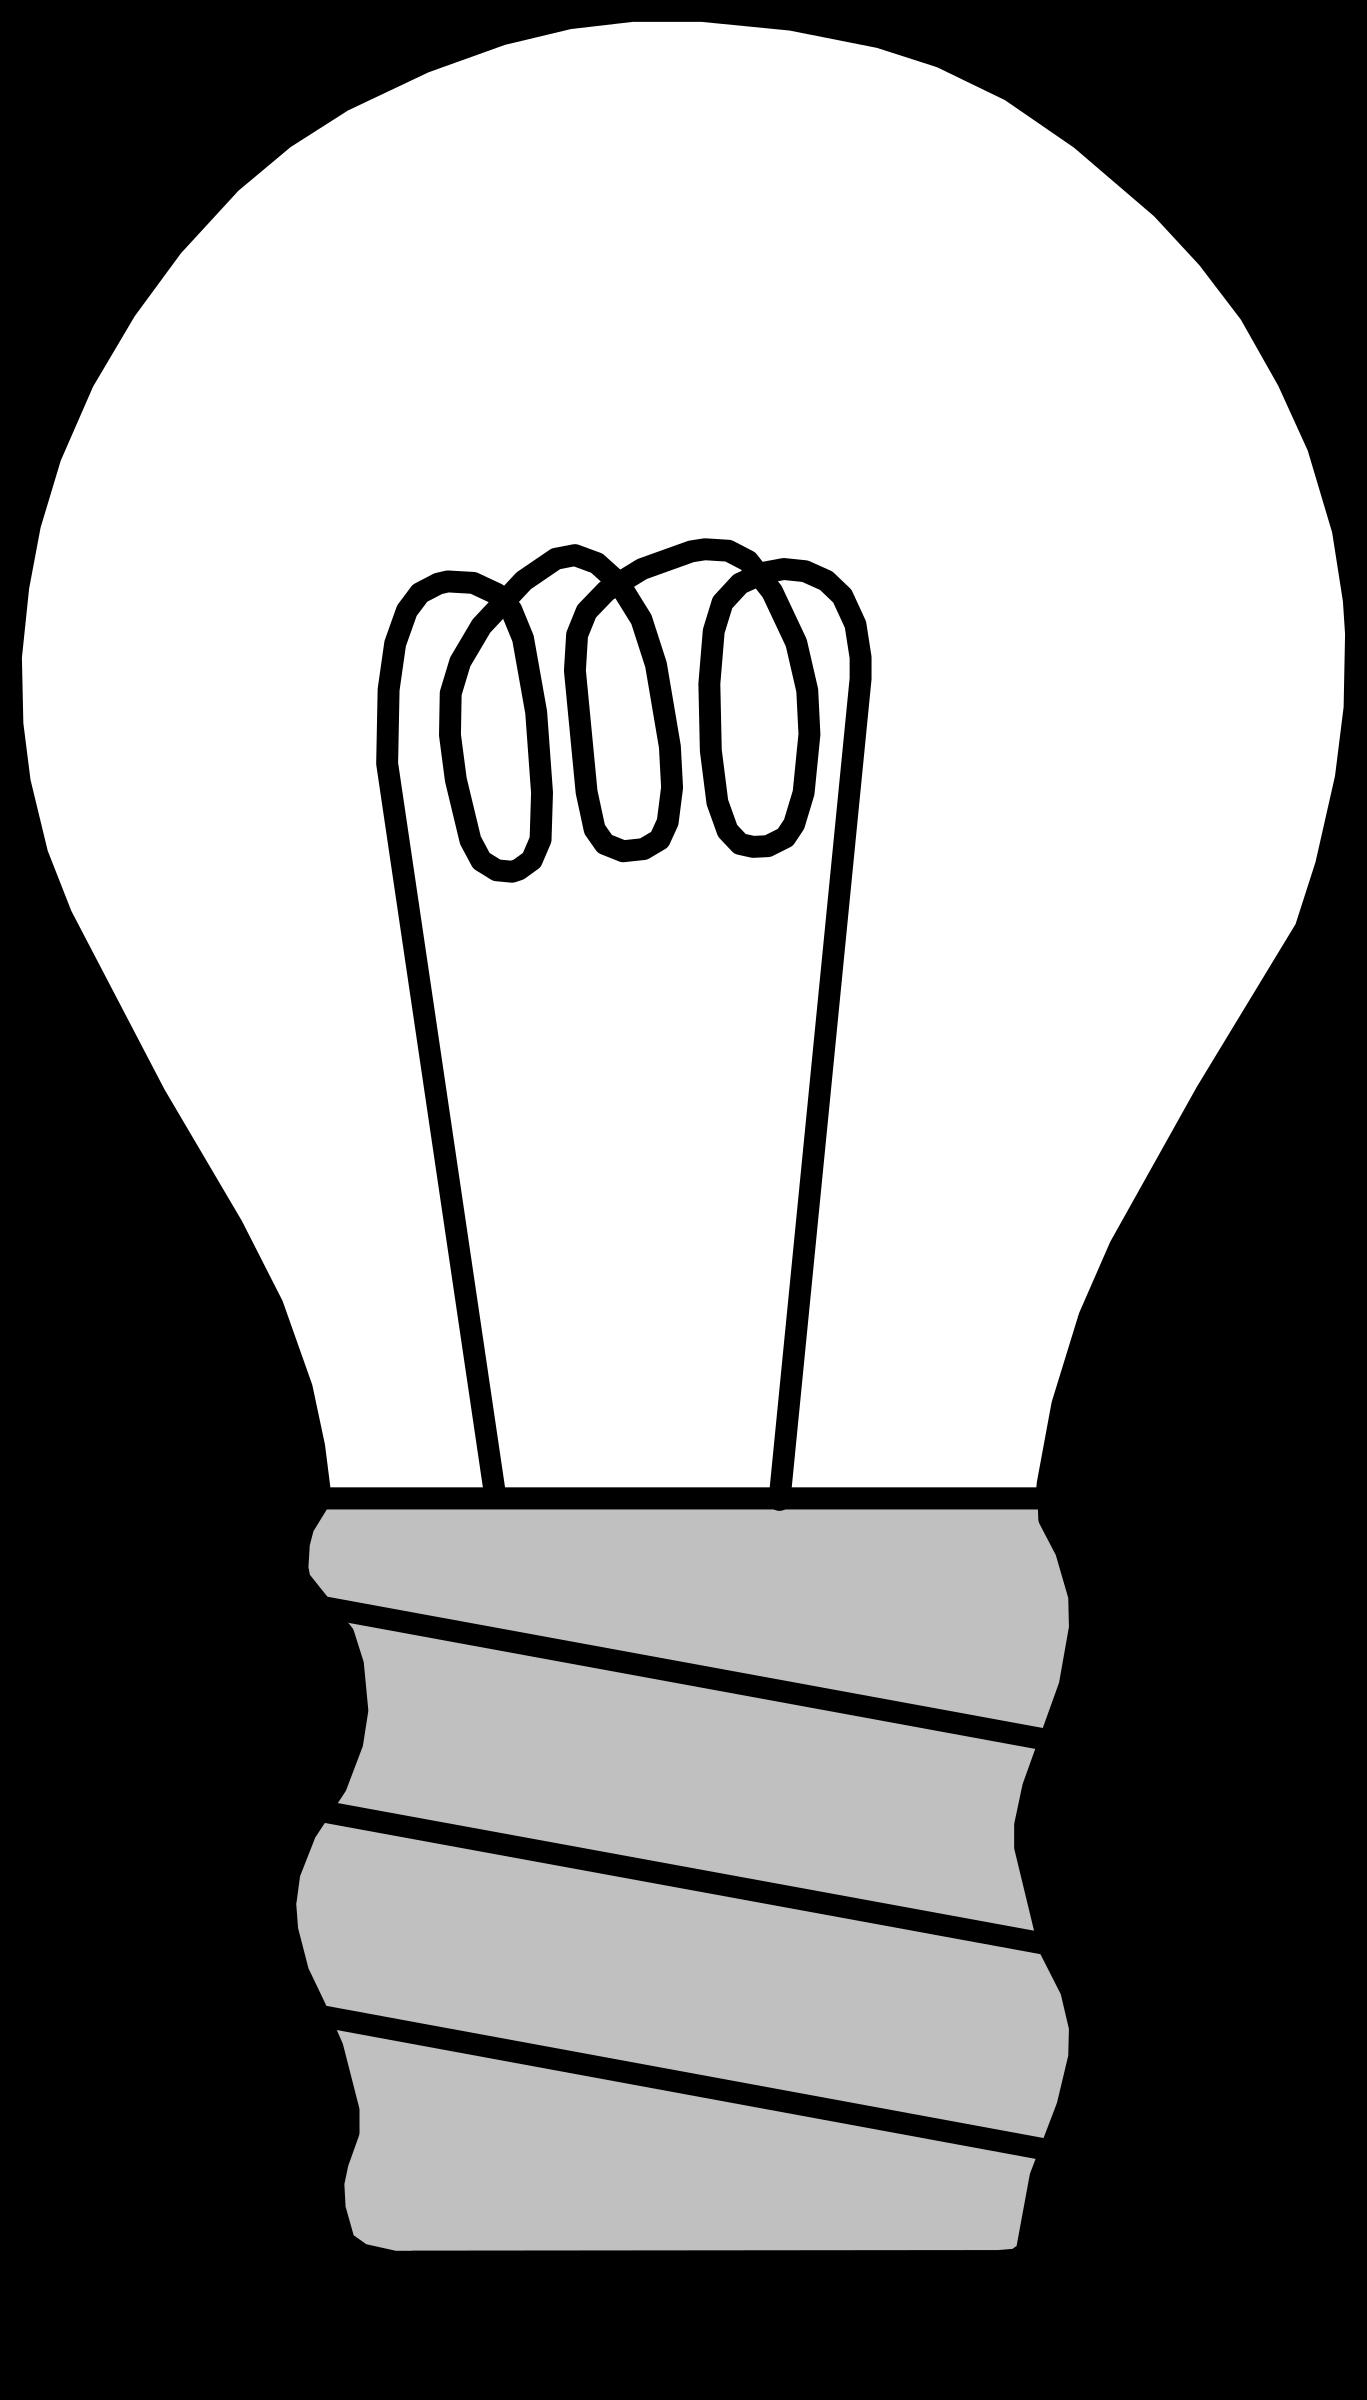 Bulb clipart turn off the light Printable #6 page: Printable bulb